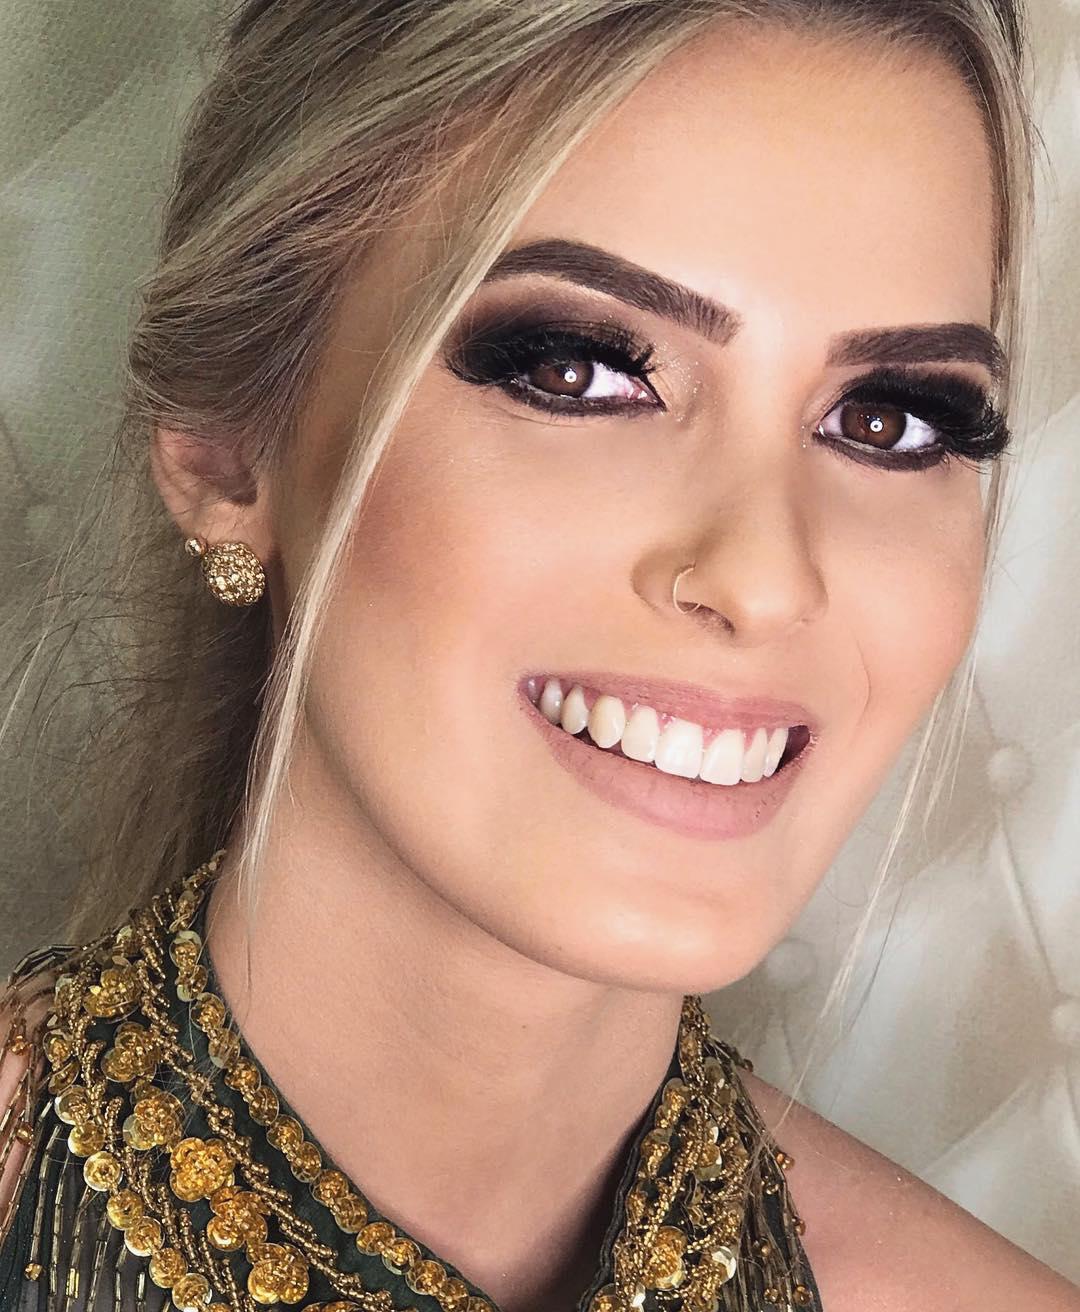 taina laydner, miss eco brasil 2019. - Página 2 22427110